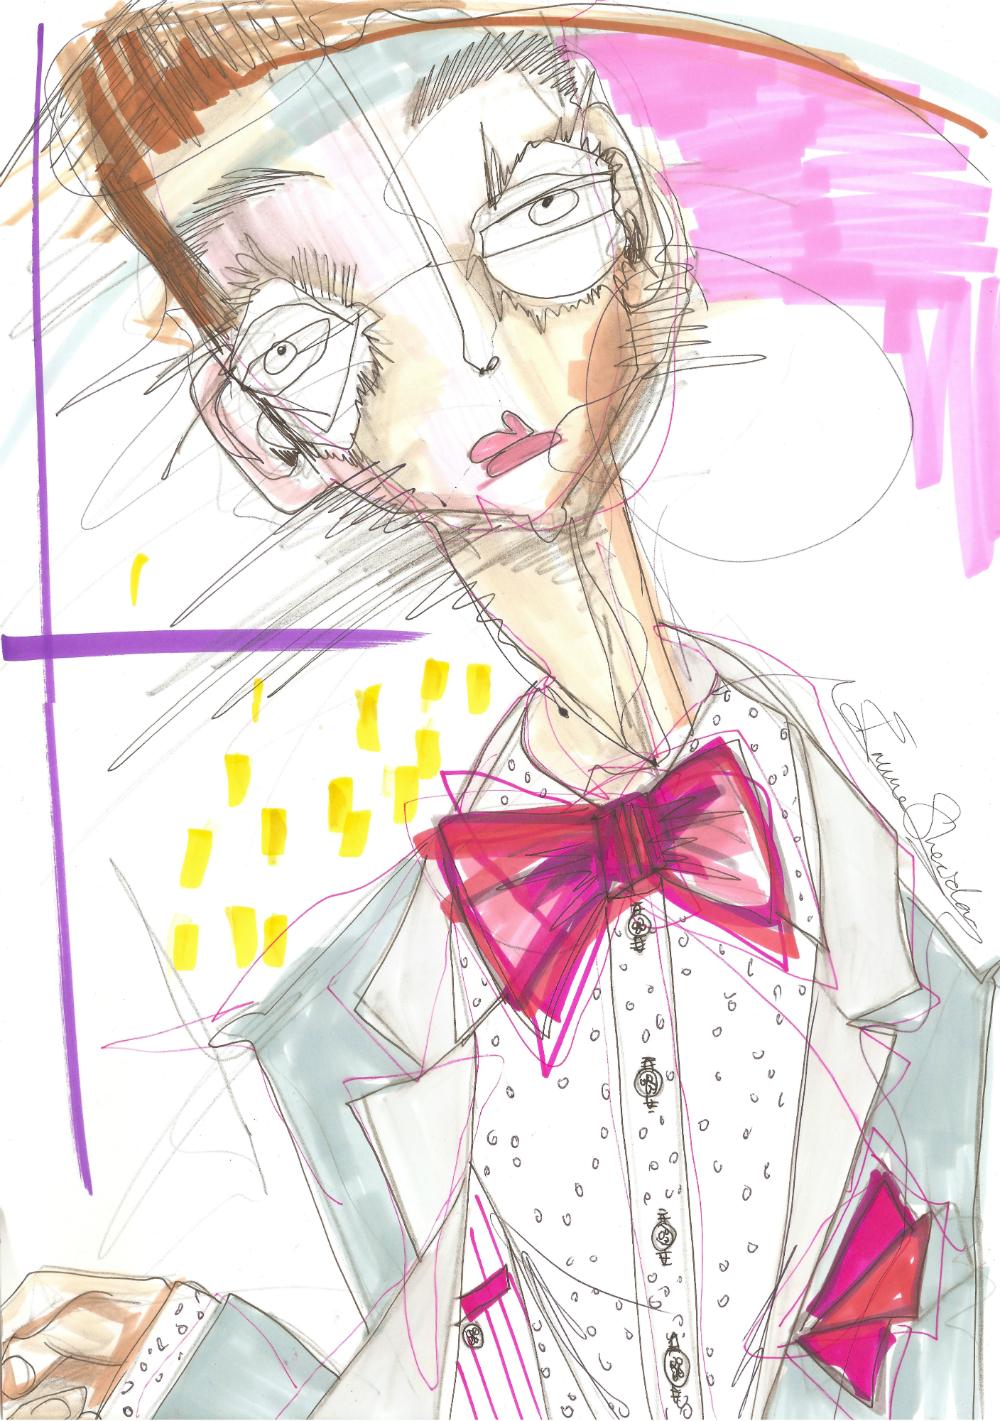 Emma Sheridan Cor Sine Labe Doli Illustration 1st prize